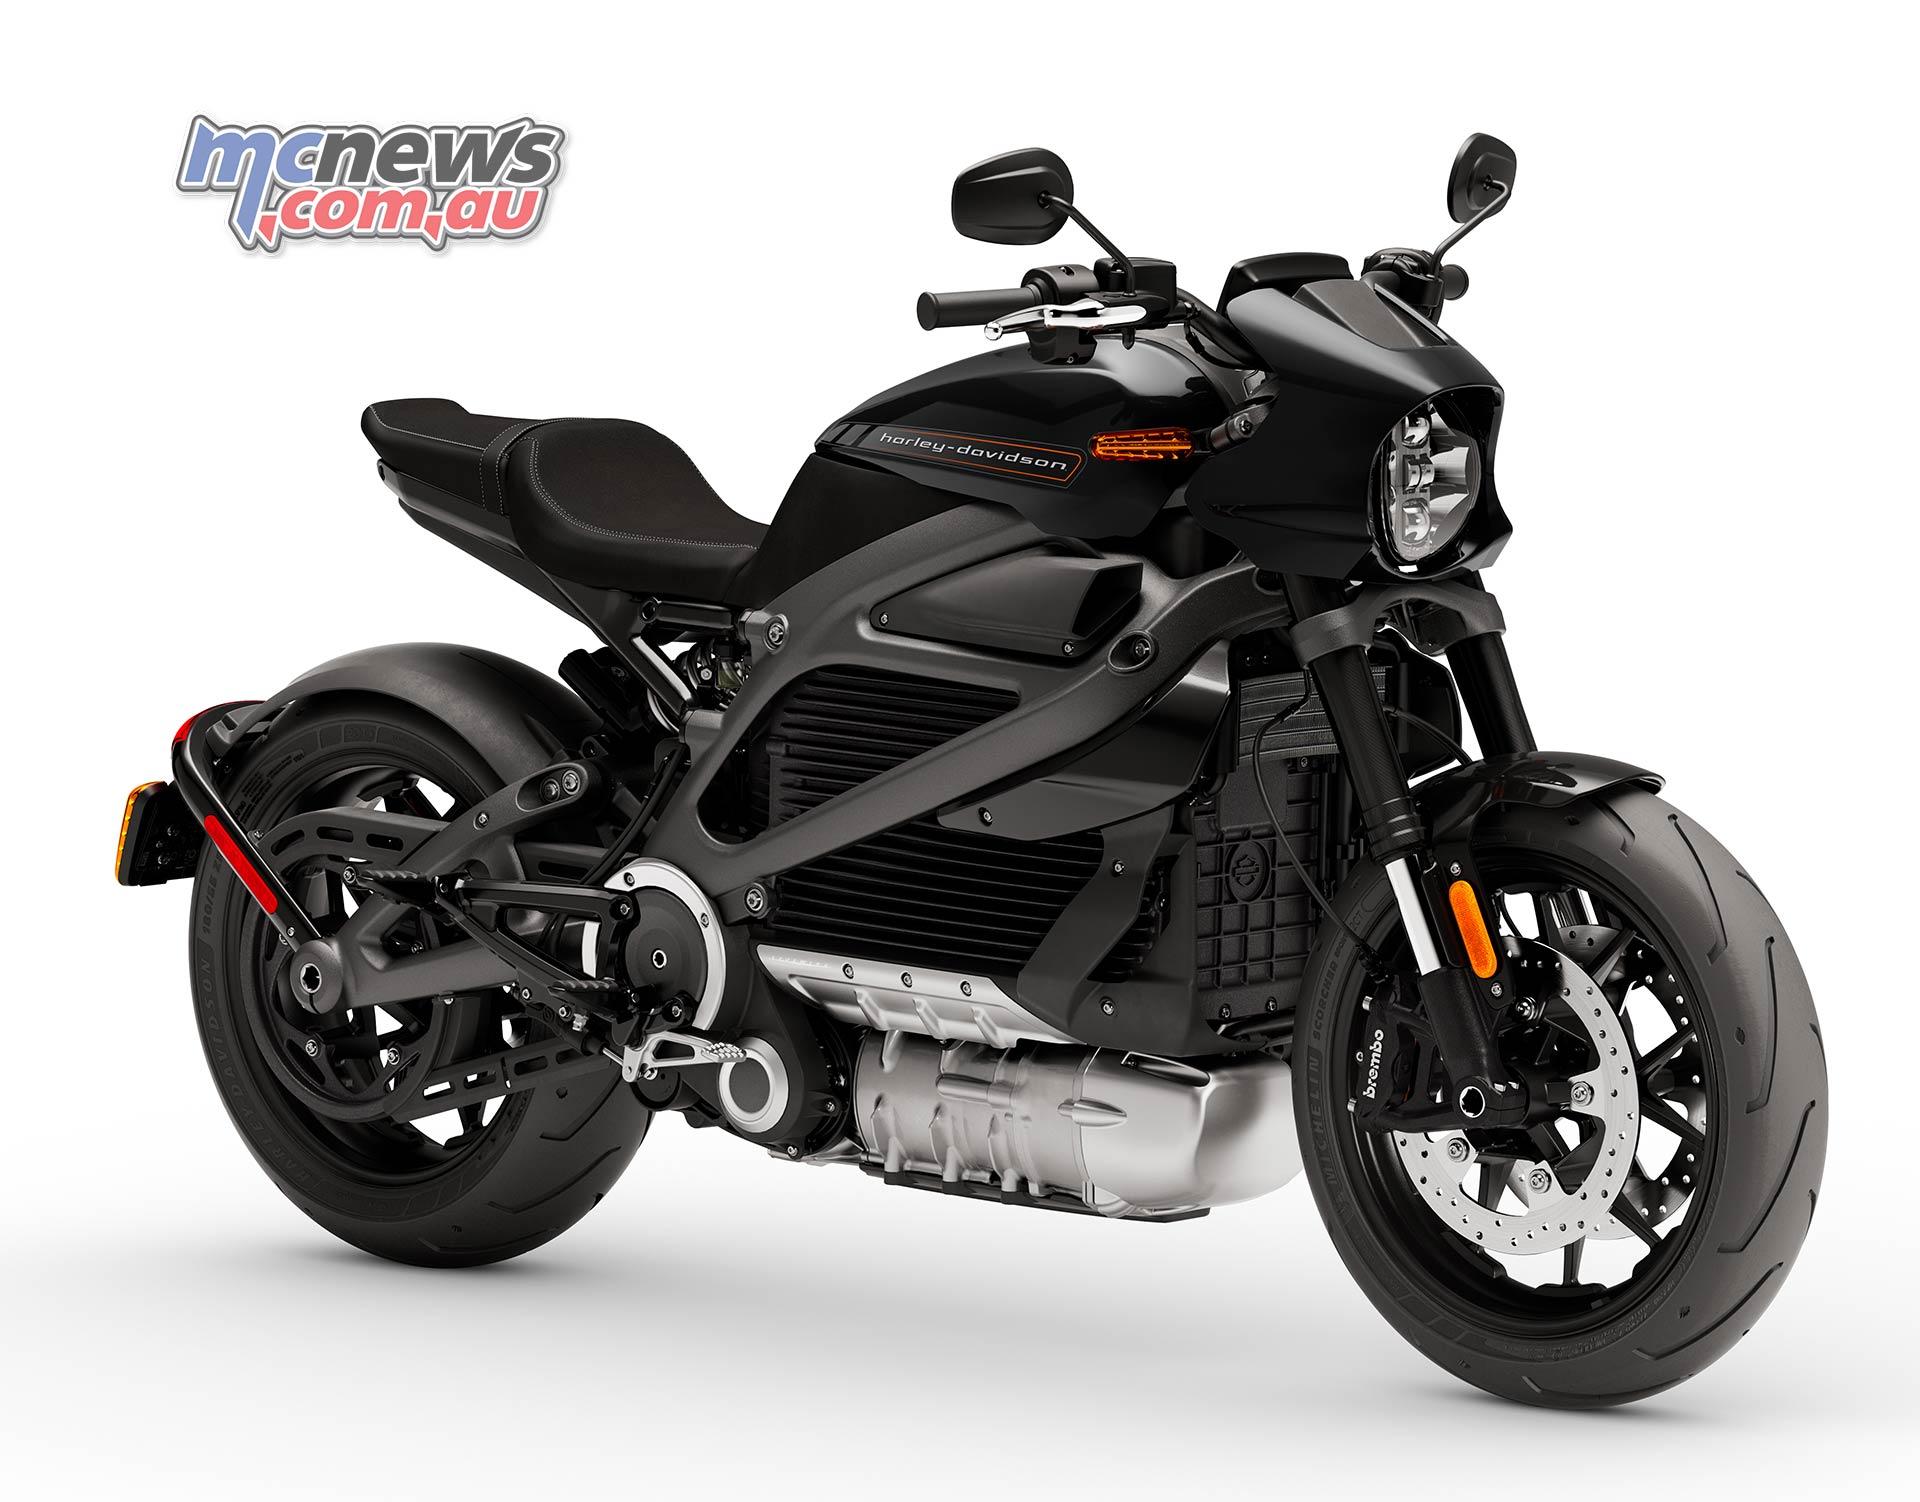 Harley Davidson Livewire 0 100 In 3s 152km Range